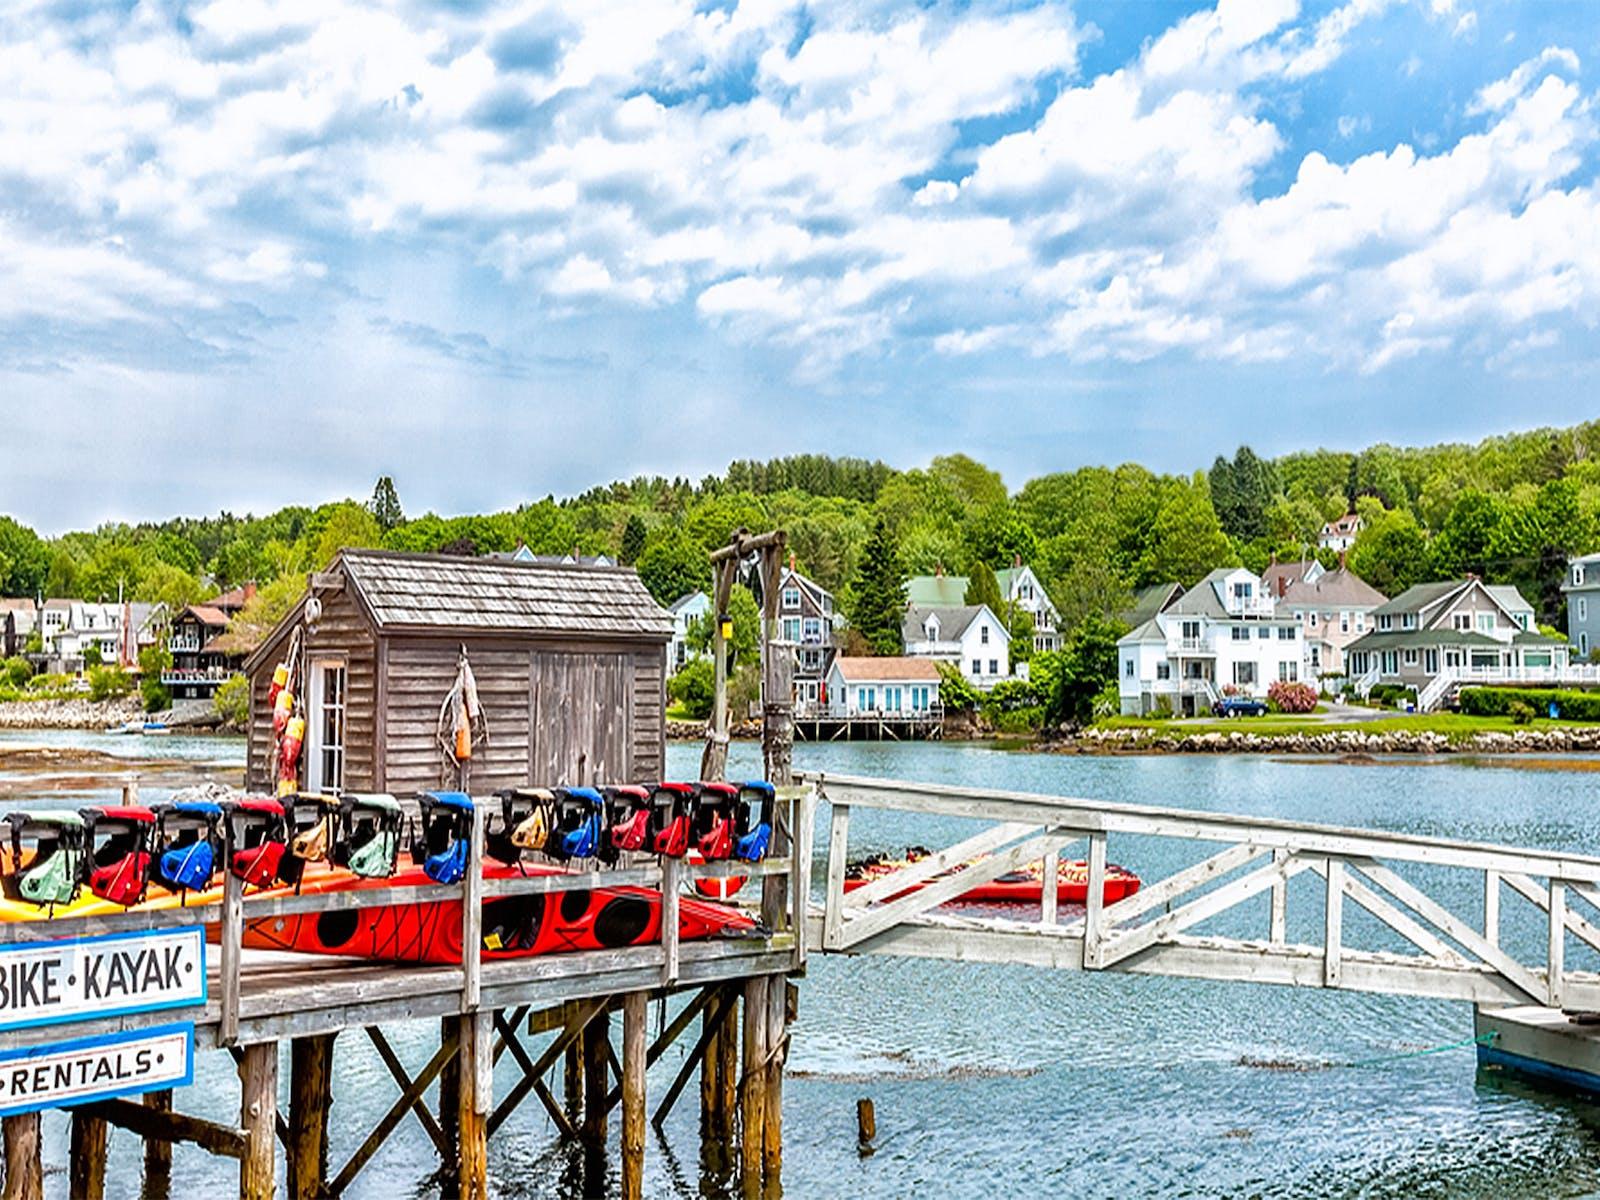 Kayak and bike rentals in Boothbay Harbor, Maine